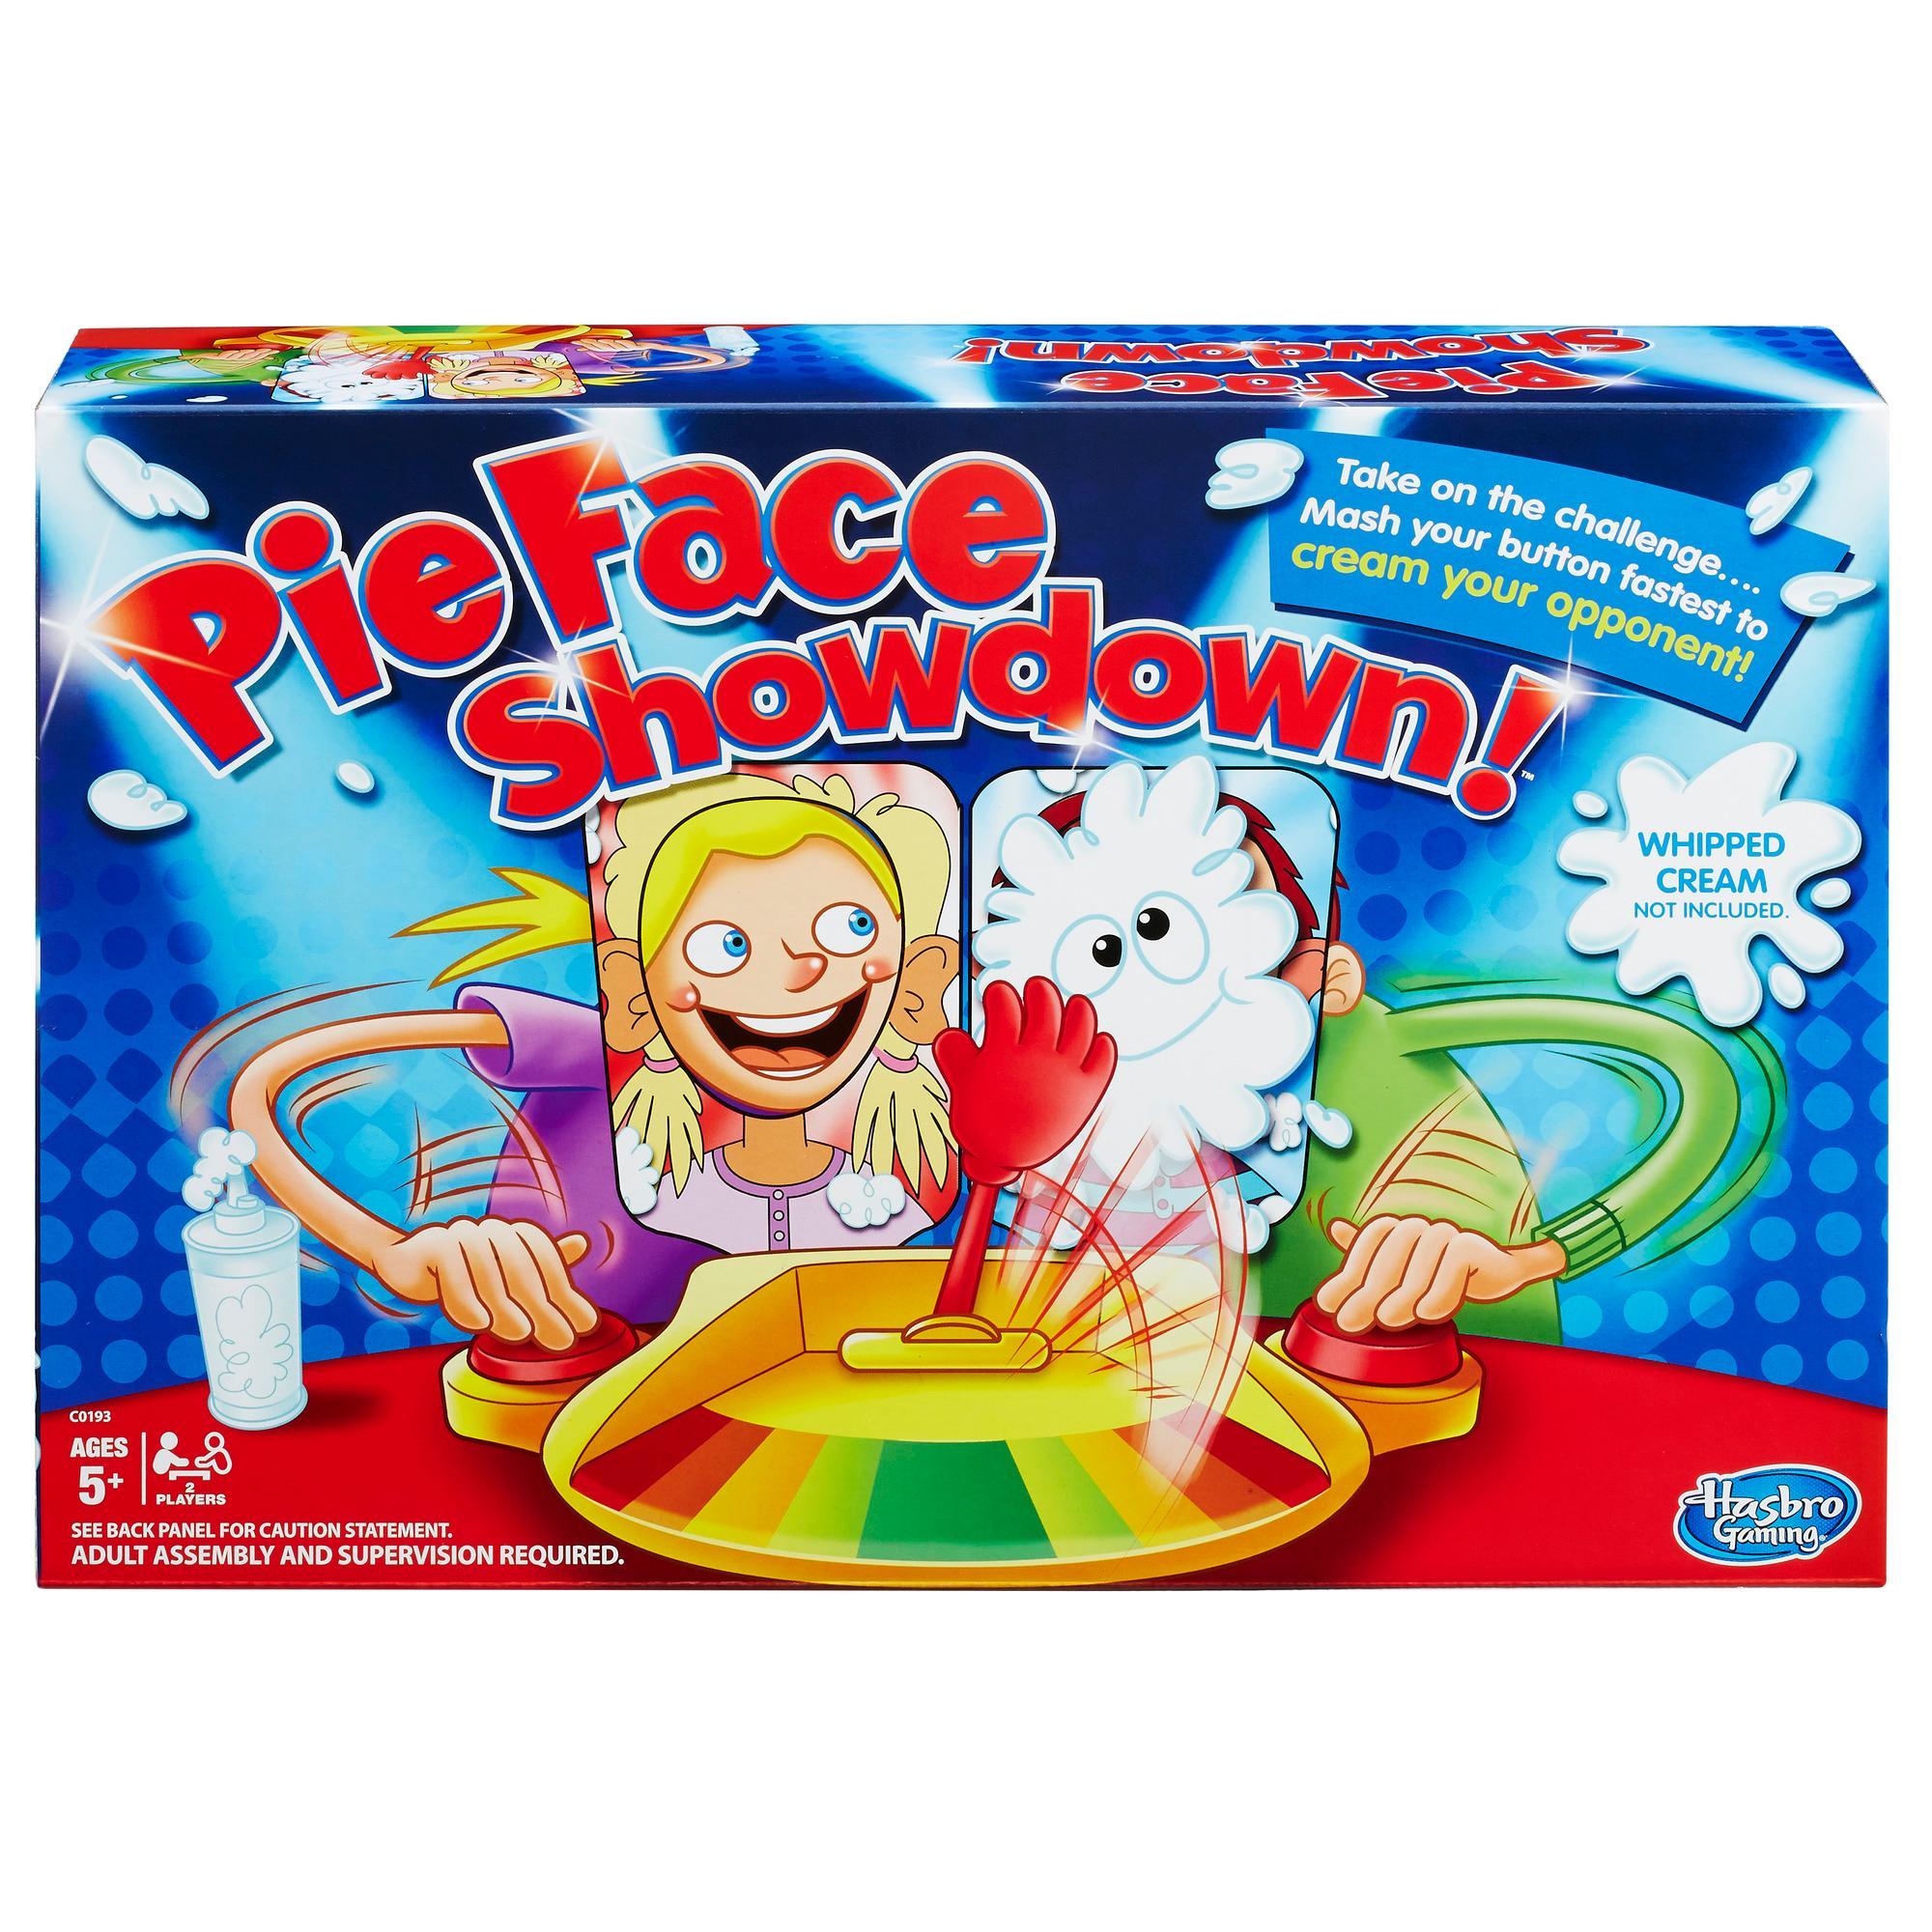 Includes 1 pie thrower, 1 throwing arm, 2 chin rests, 2 splash-card